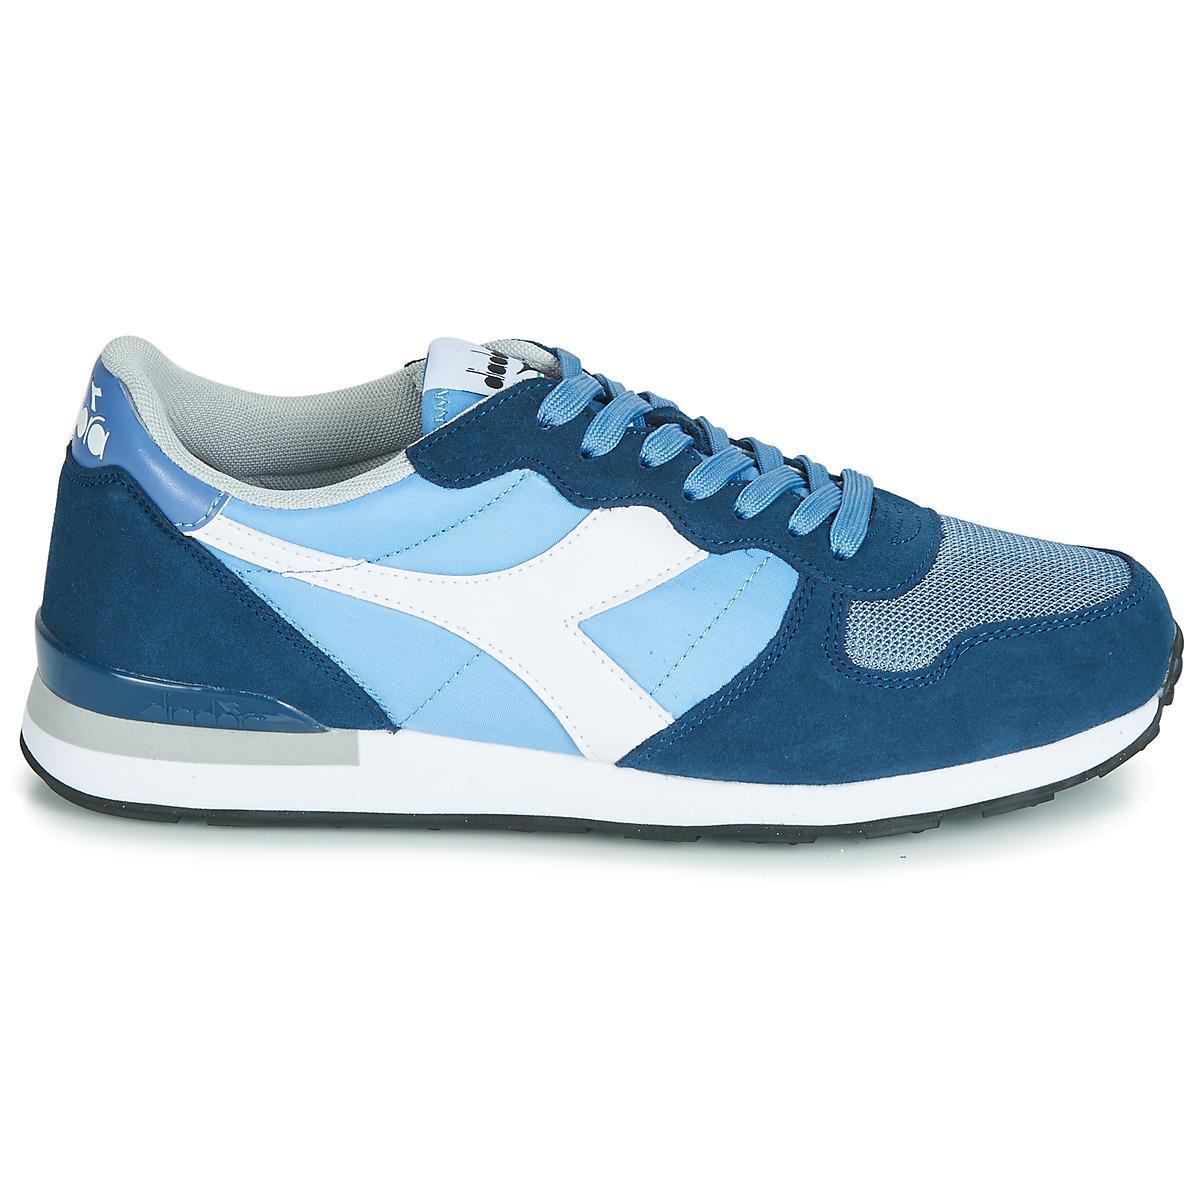 bb377d41d33 Diadora - Camaro Men's Shoes (trainers) In Blue for Men - Lyst. View  fullscreen